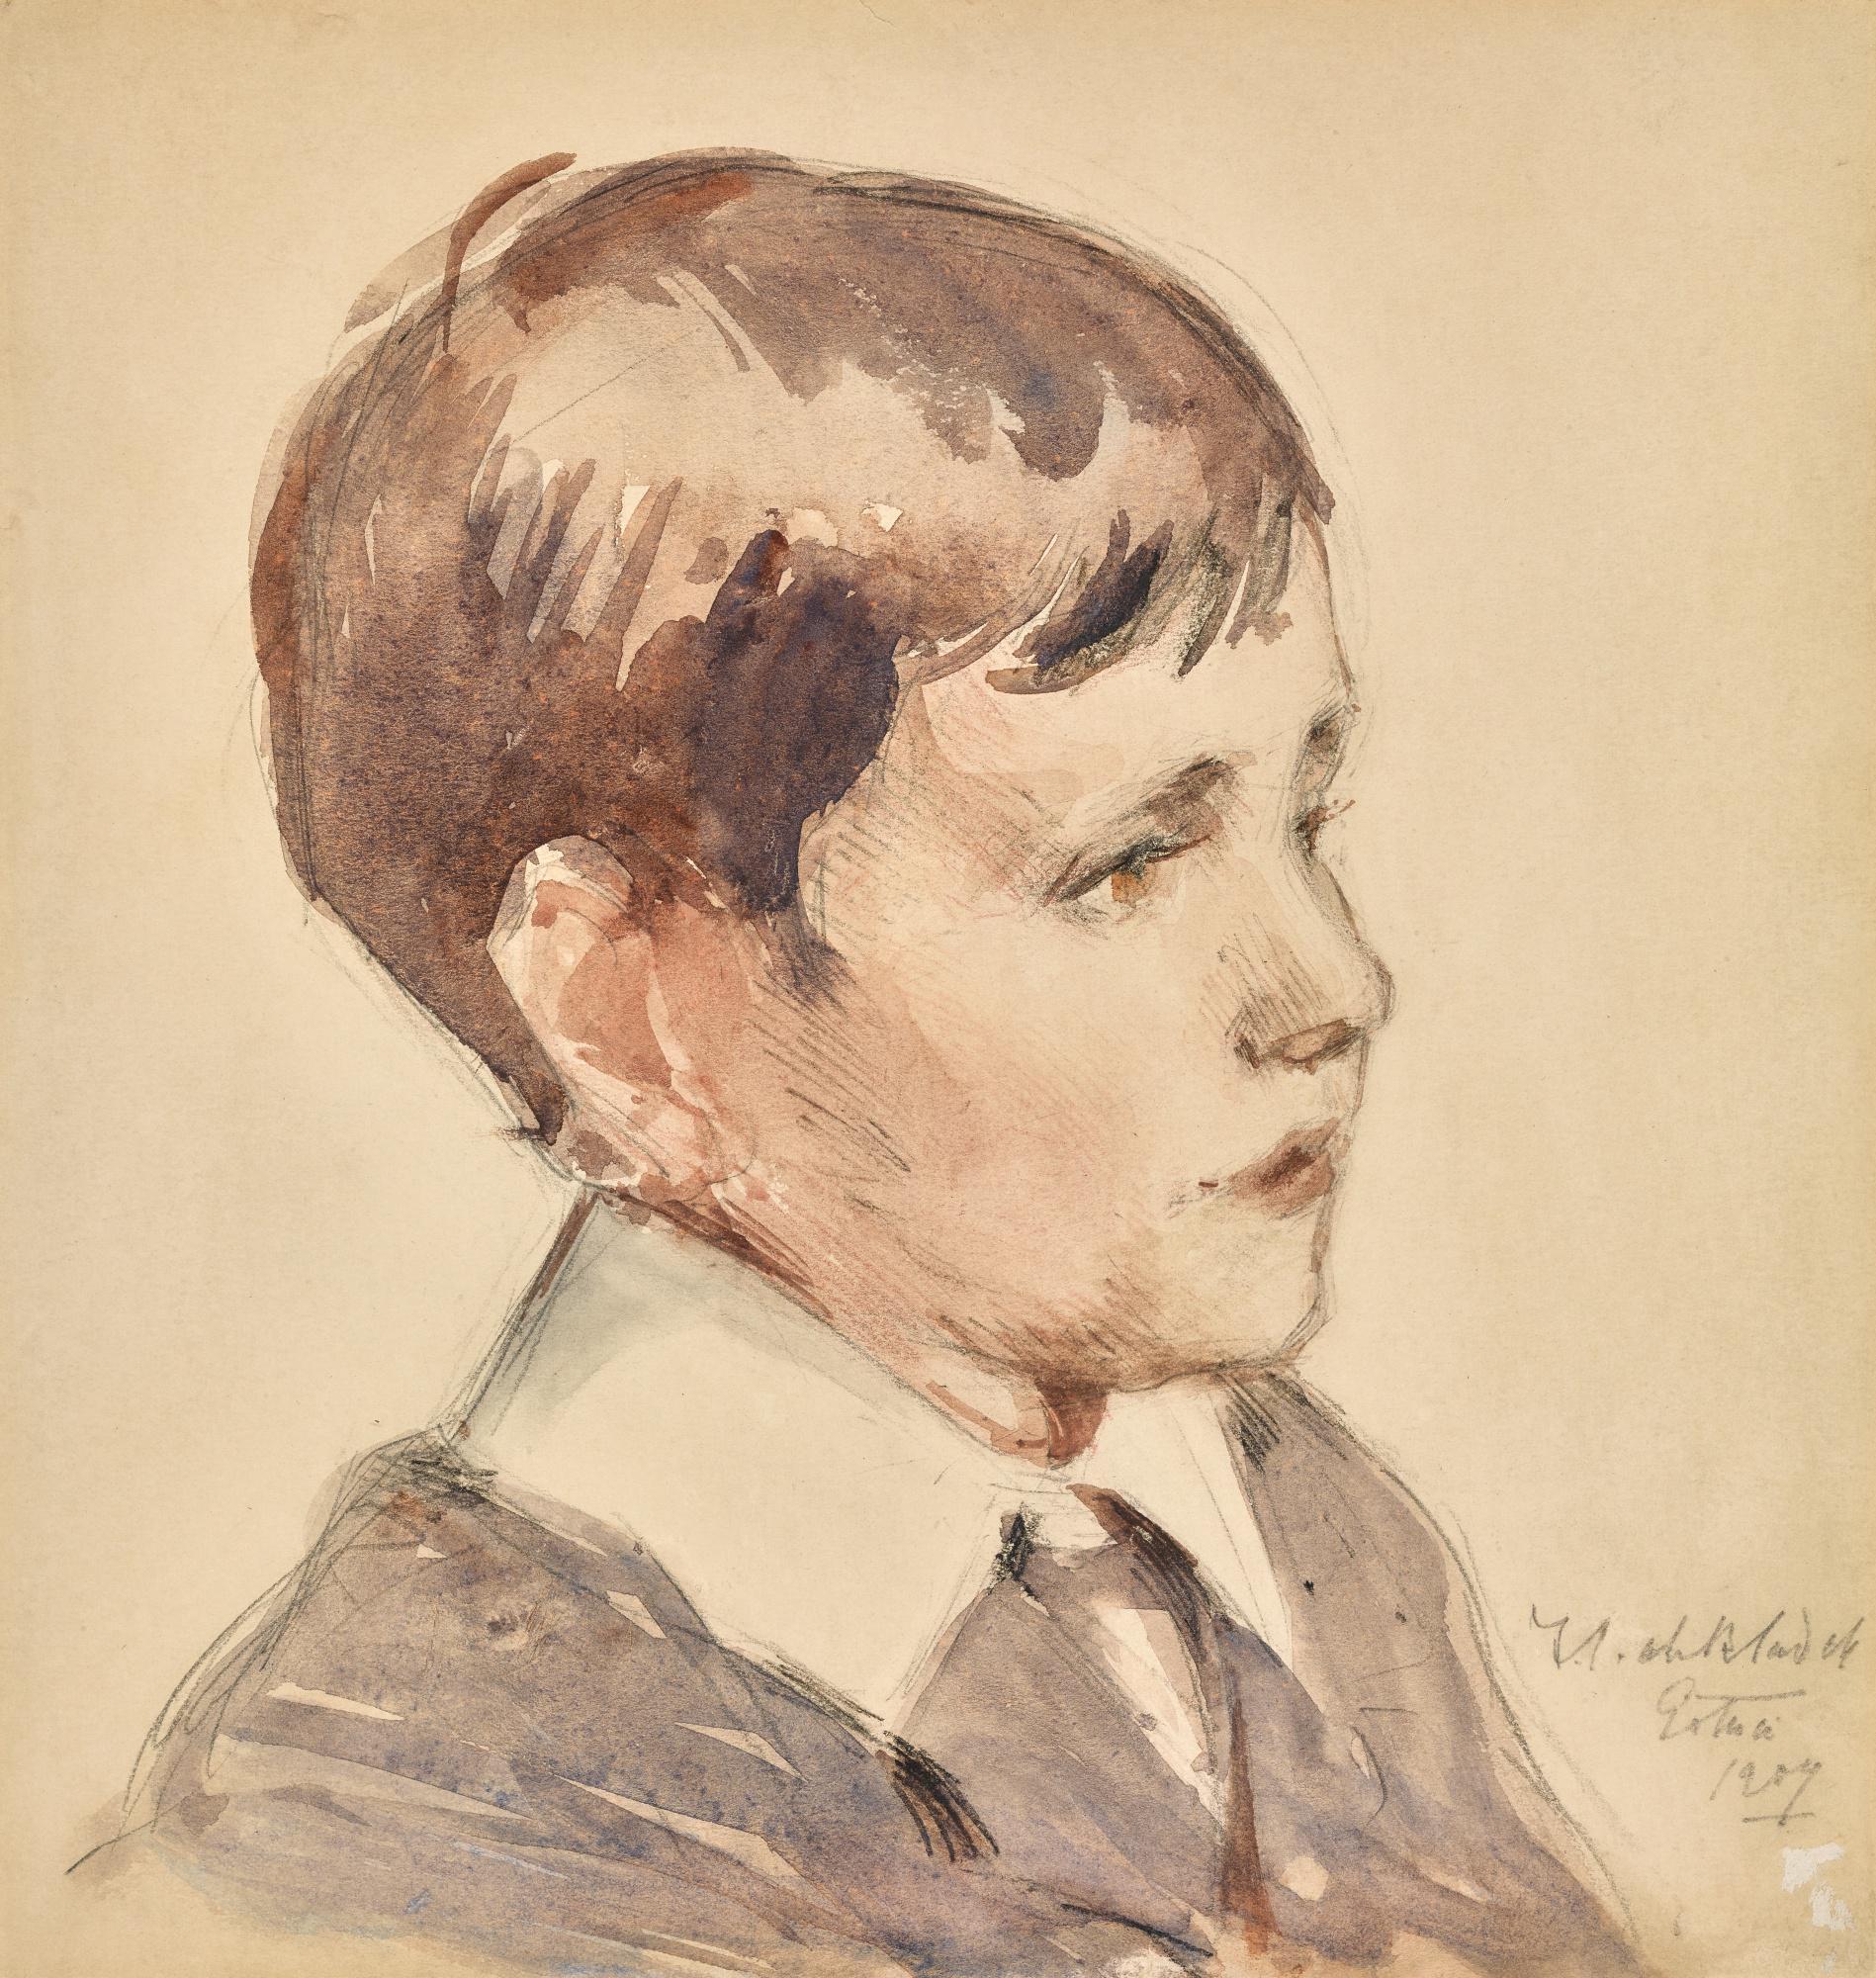 FRANCIS CAMPBELL BOILEAU CADELL, R.S.A., R.S.W.   HEAD OF A BOY